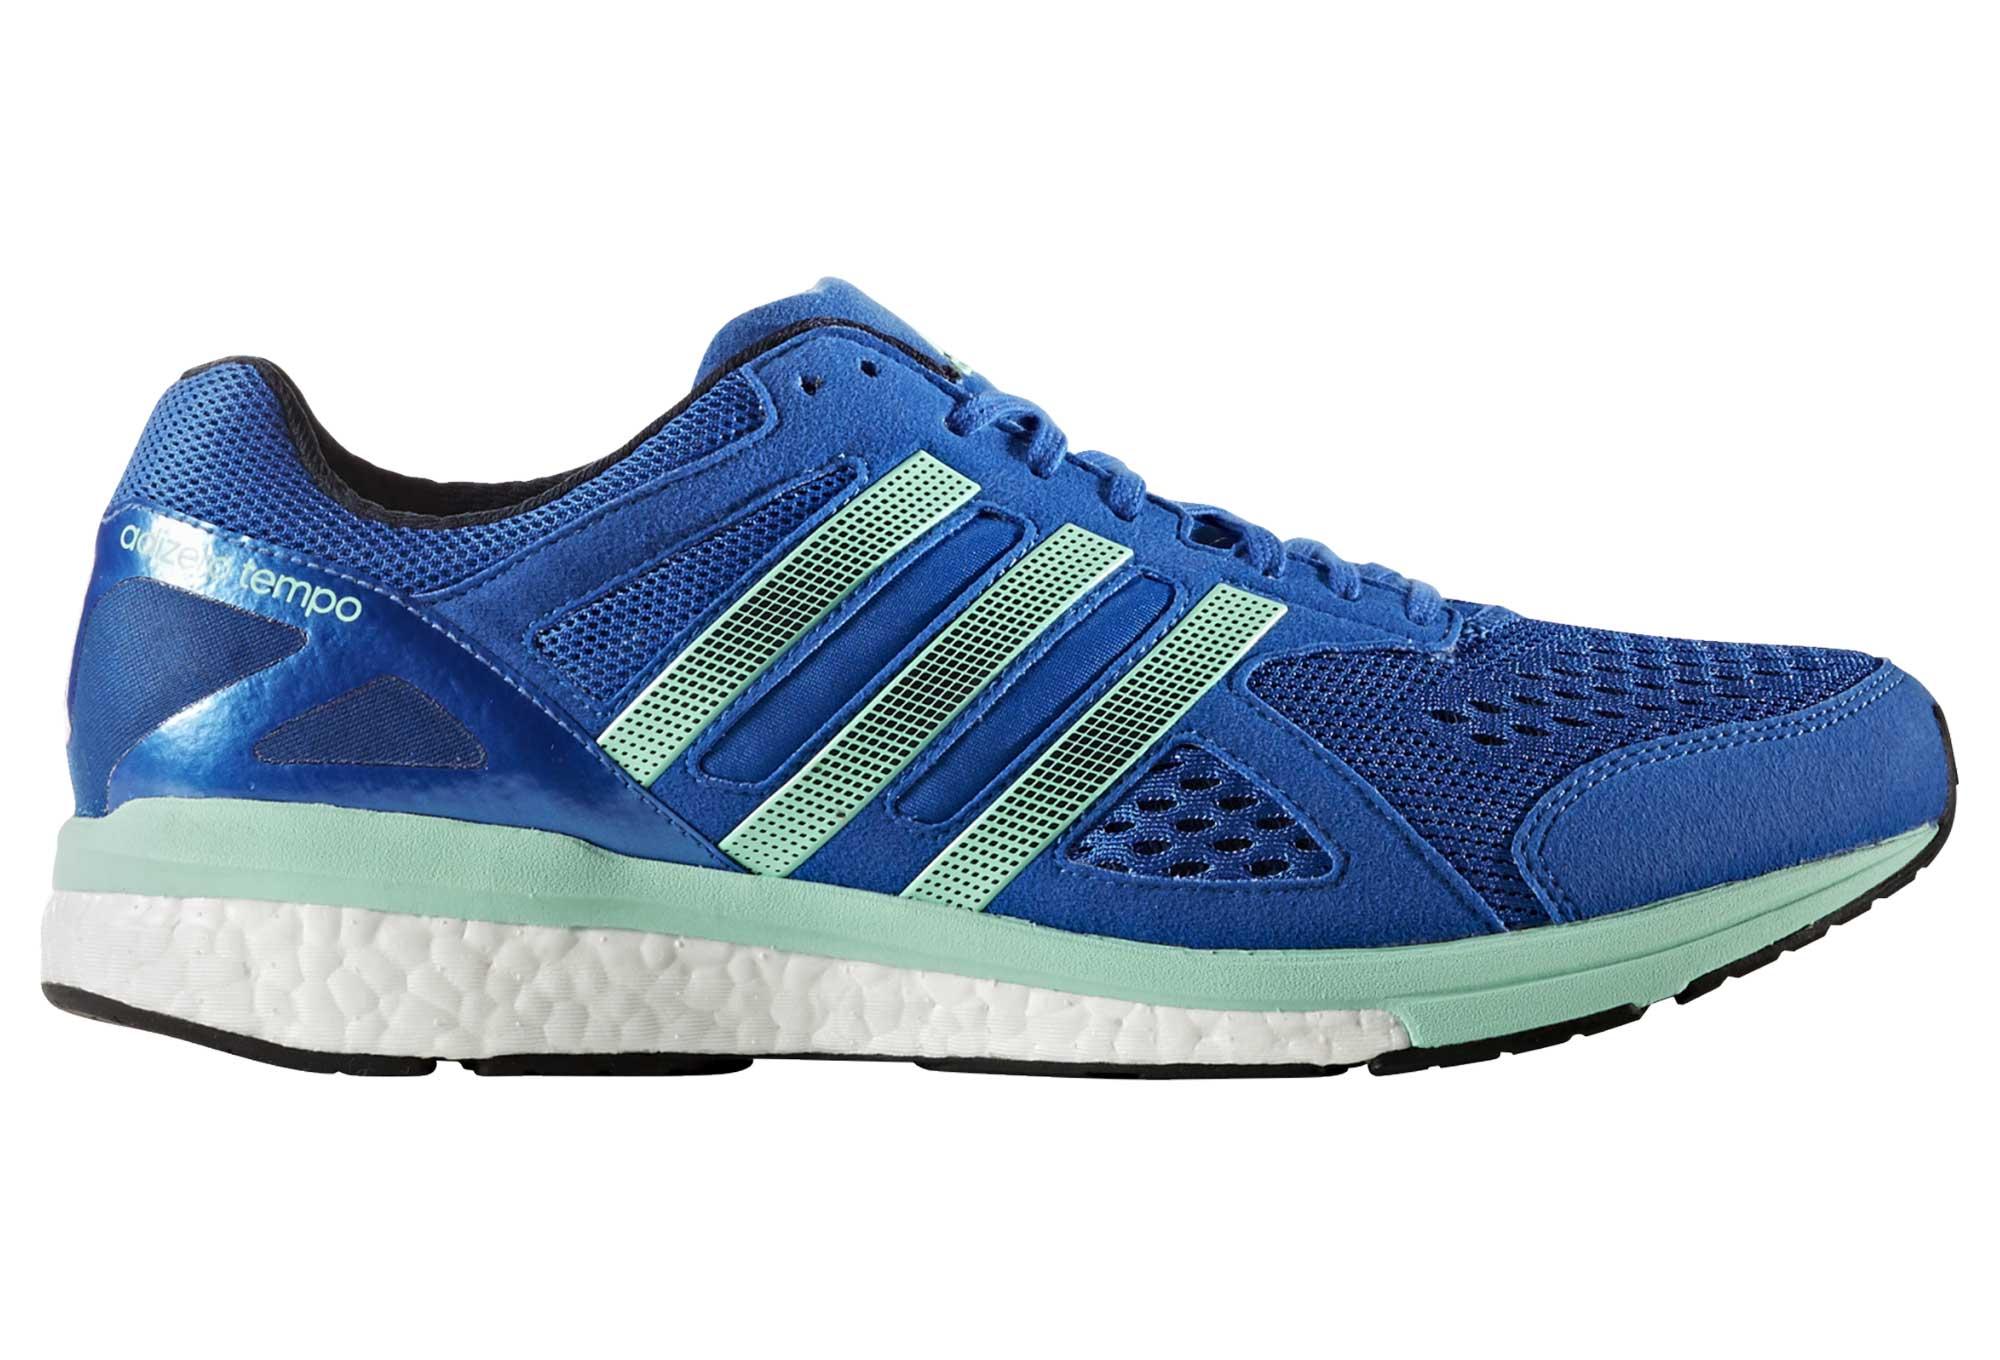 d698c1e38be adidas running adizero TEMPO 8 Blue Green Men